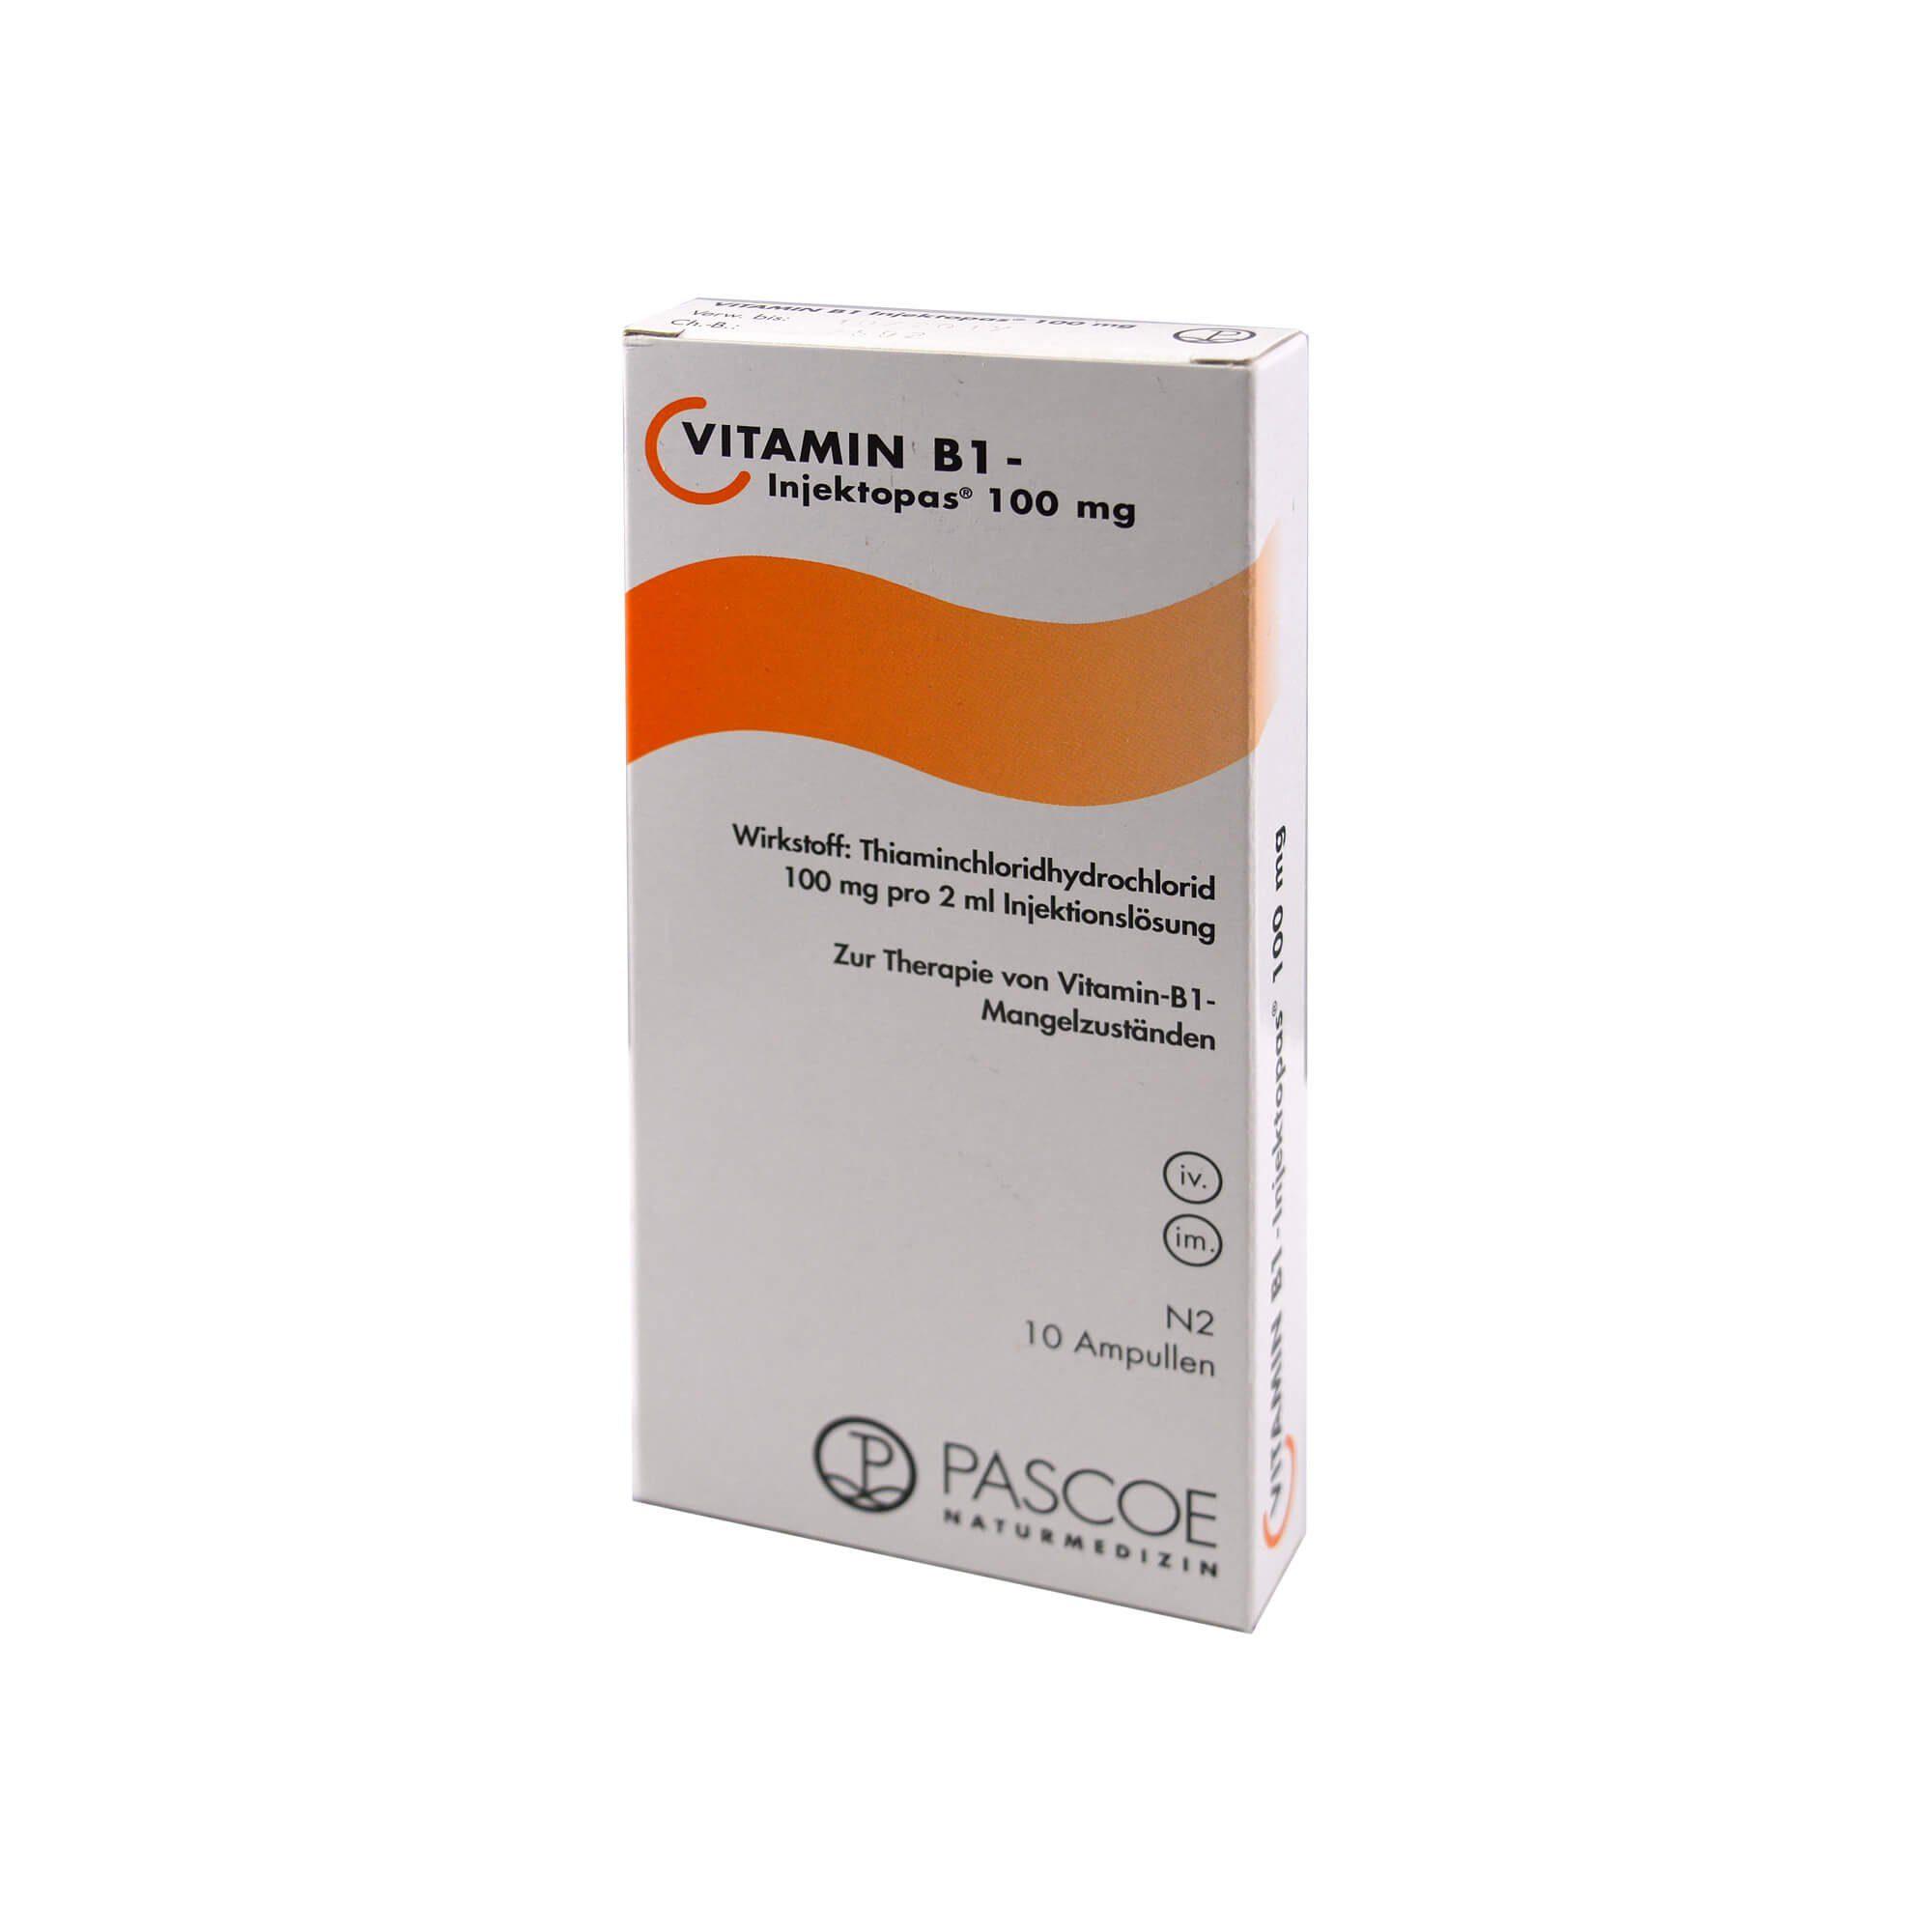 Vitamin B1 Injektopas 100 Mg Injektionslösung (, 10X2 ml)